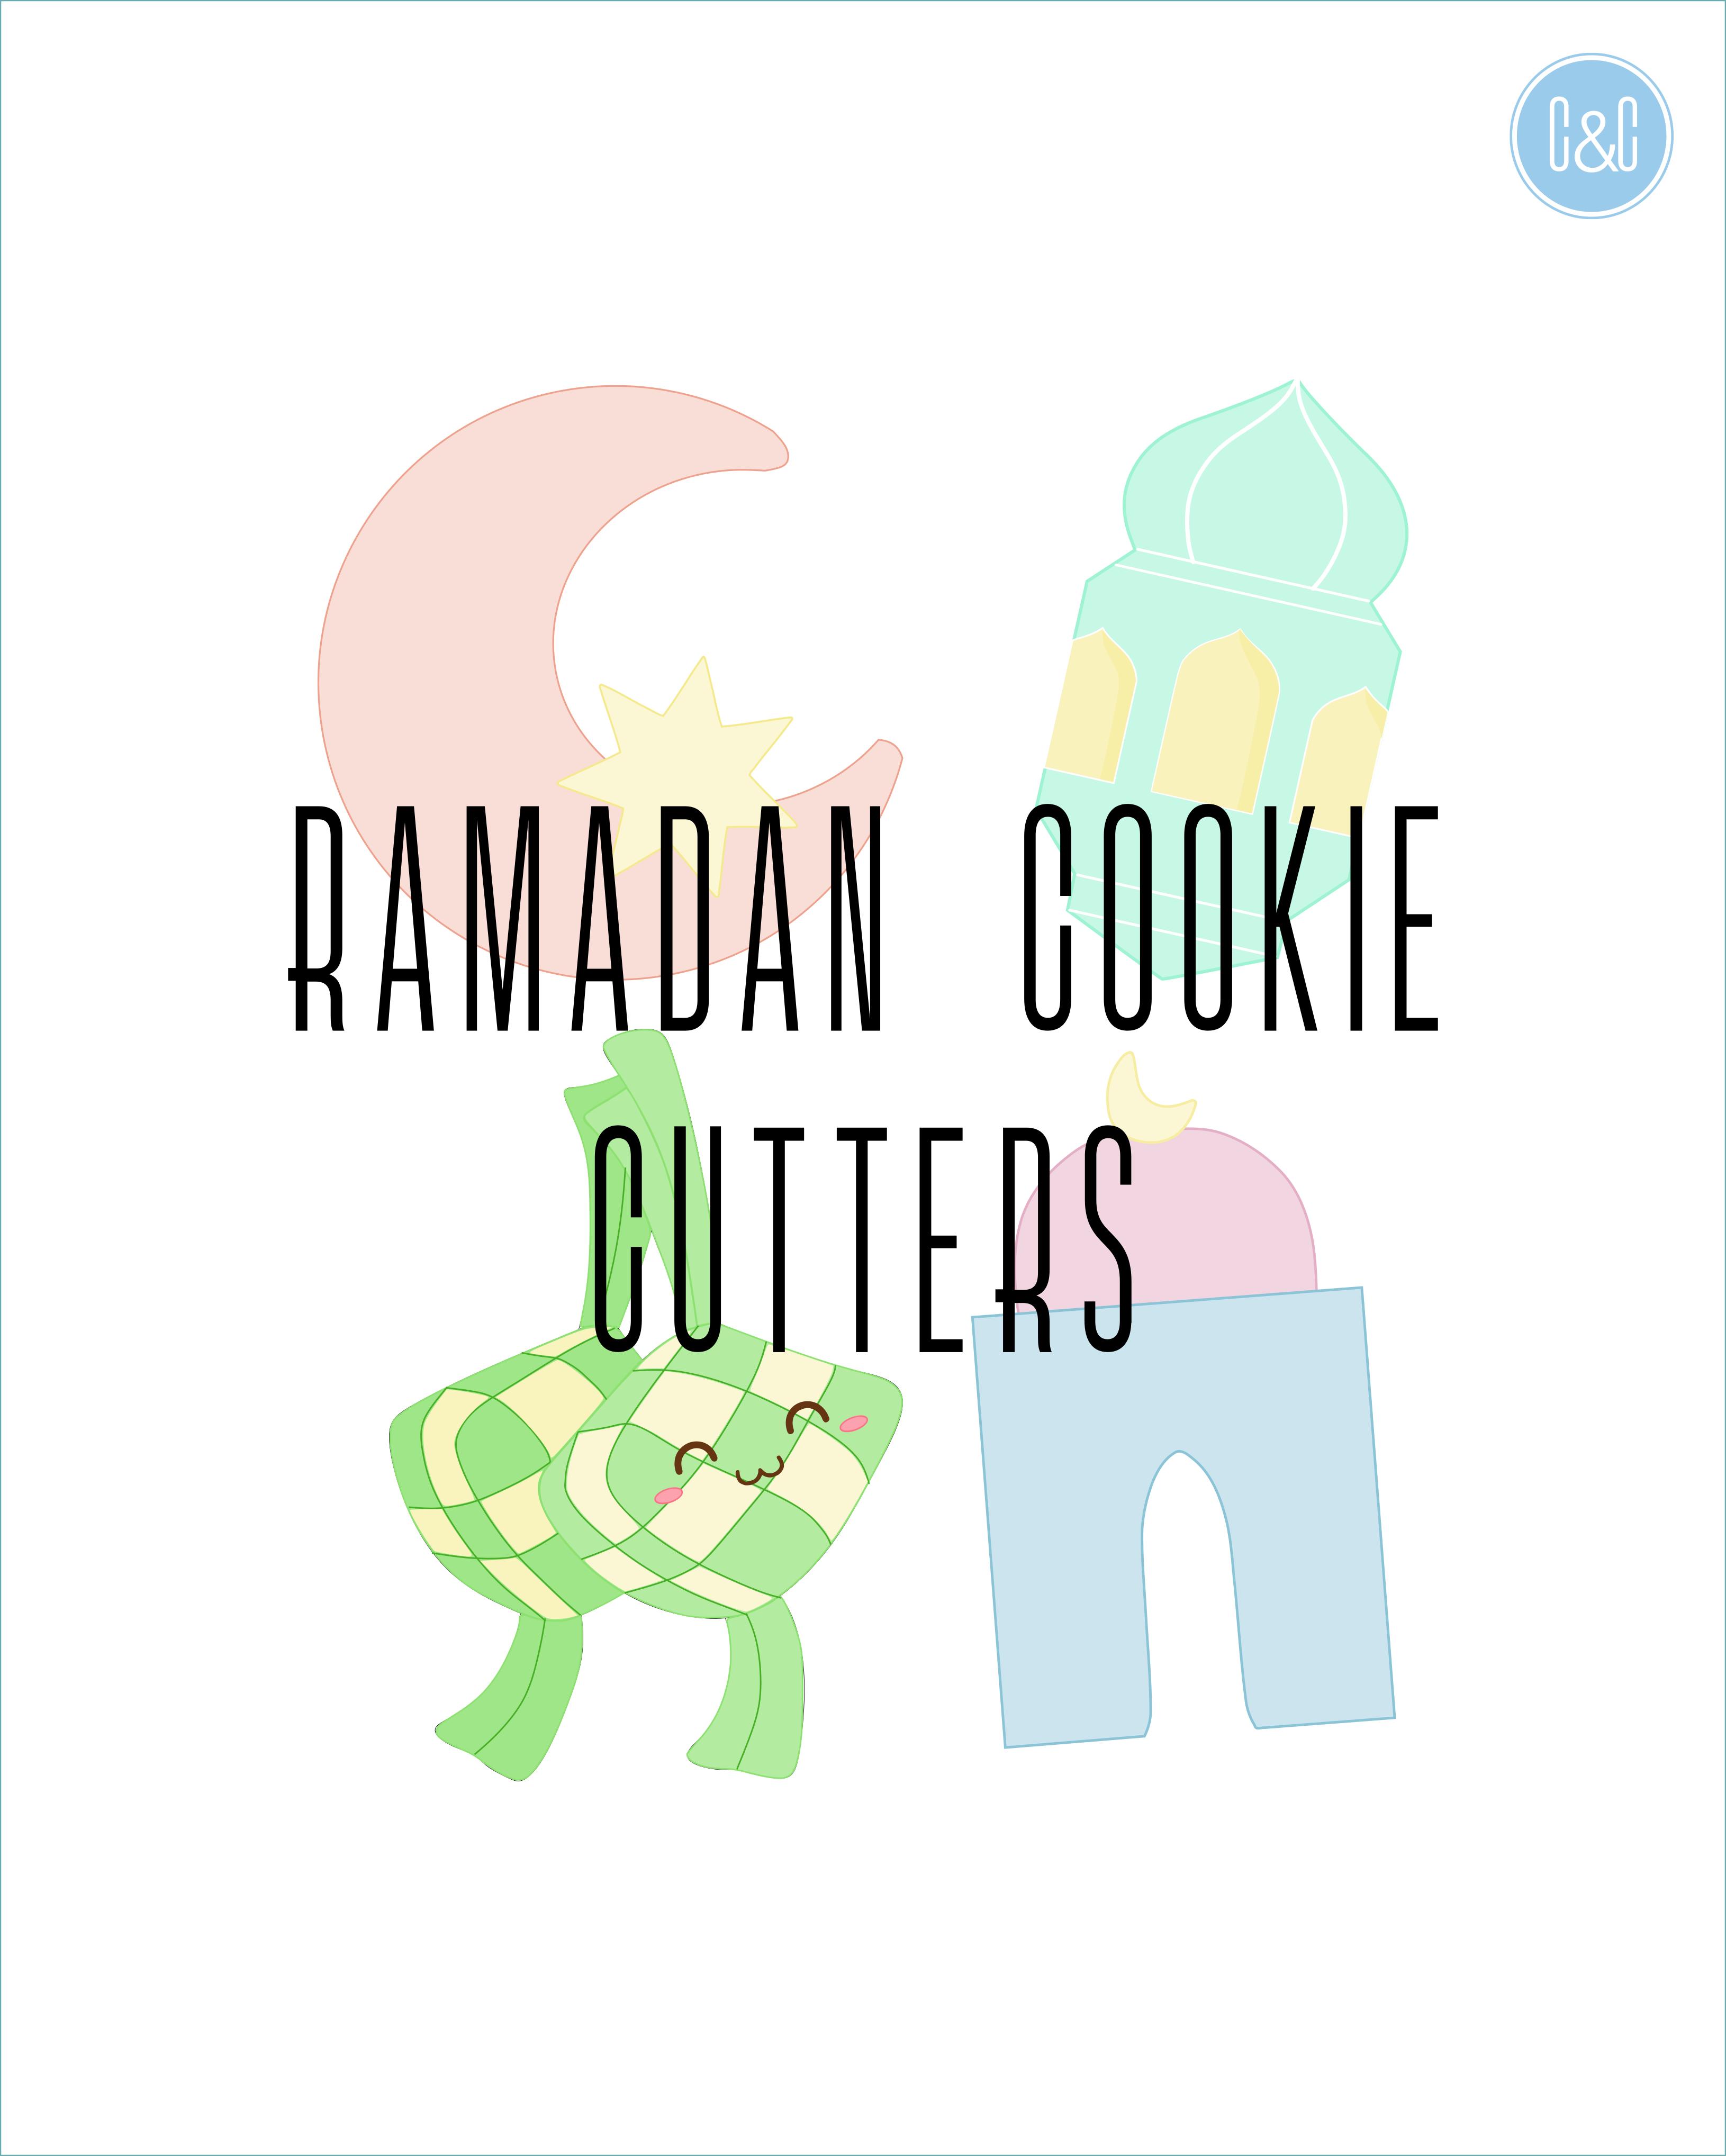 Ramadan Kareem Eid Mubarak Hari Raya Cookie Cutter Embosser Mosque Star Moon Ketupat Lantern Ramadan Baby Shower Party Decorations Etsy